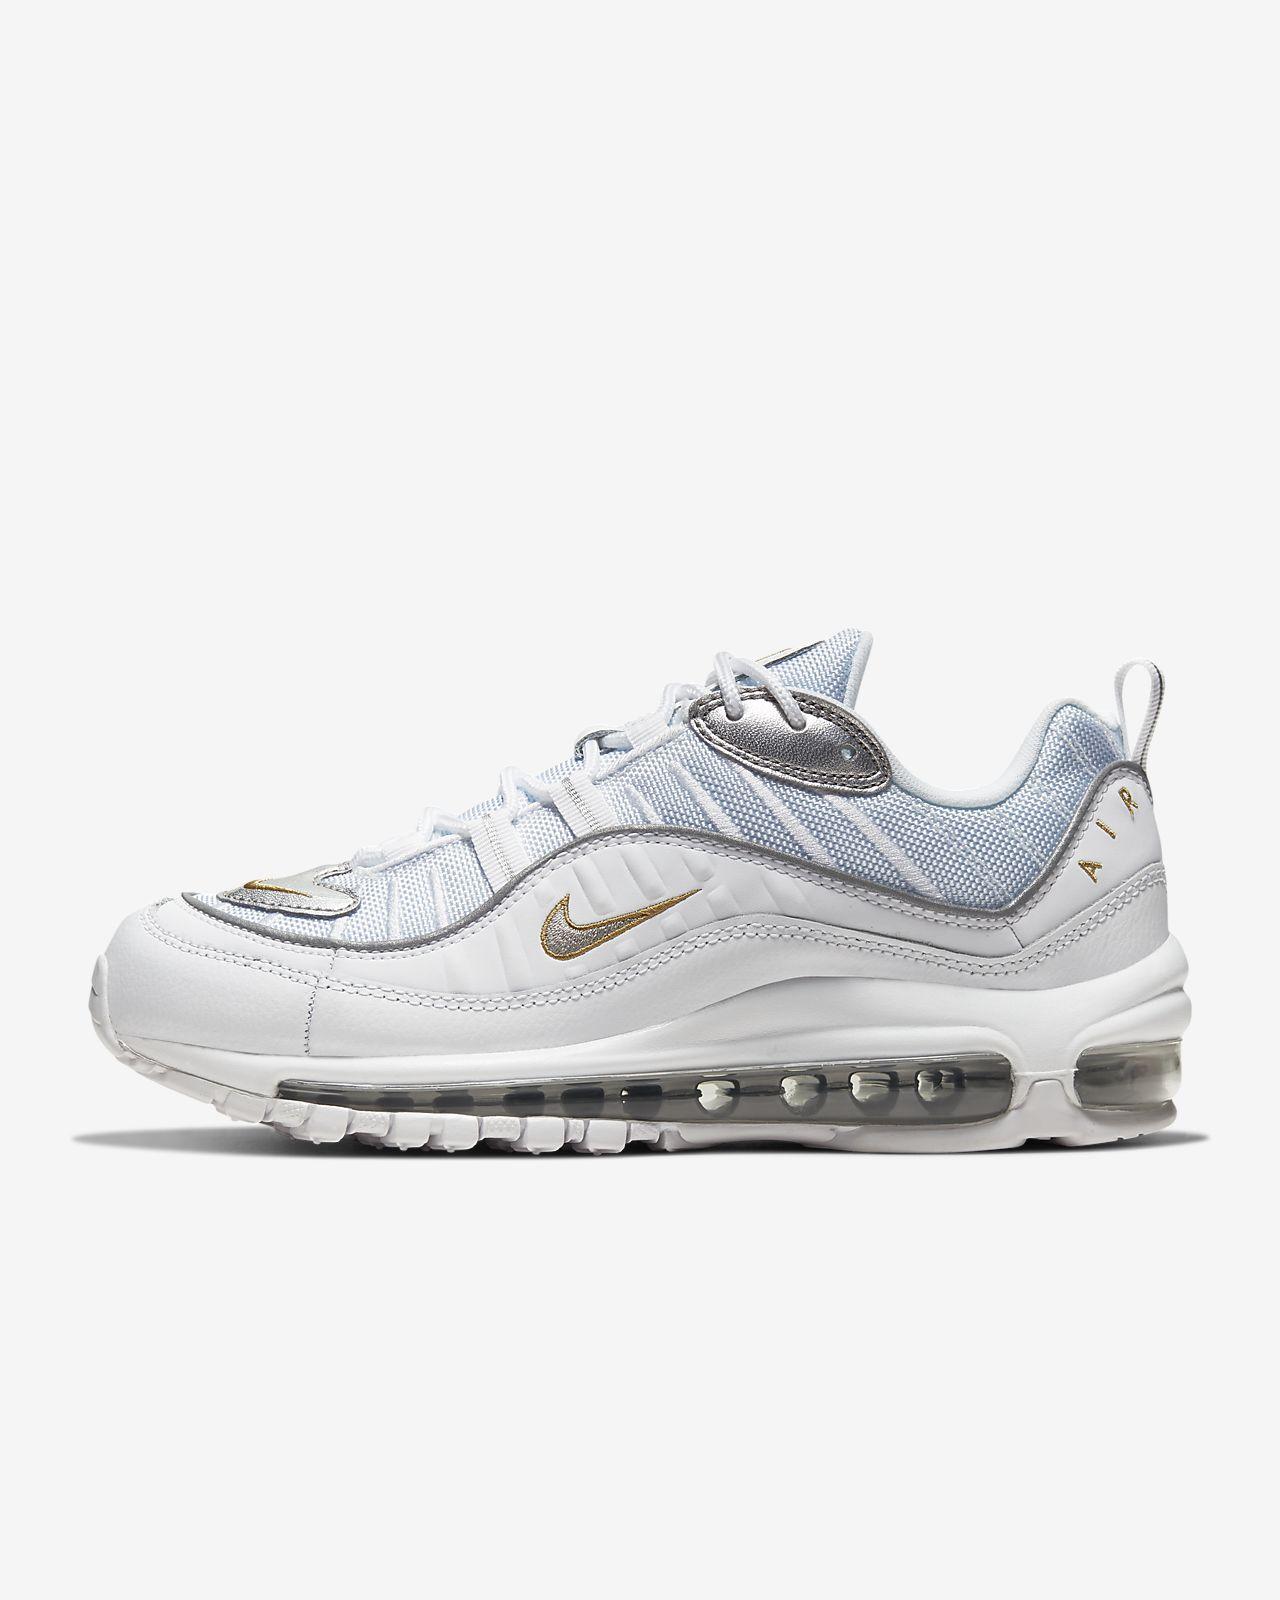 Nike Air Max 98 Scarpe da Ginnastica, Uomo, Bianco (White